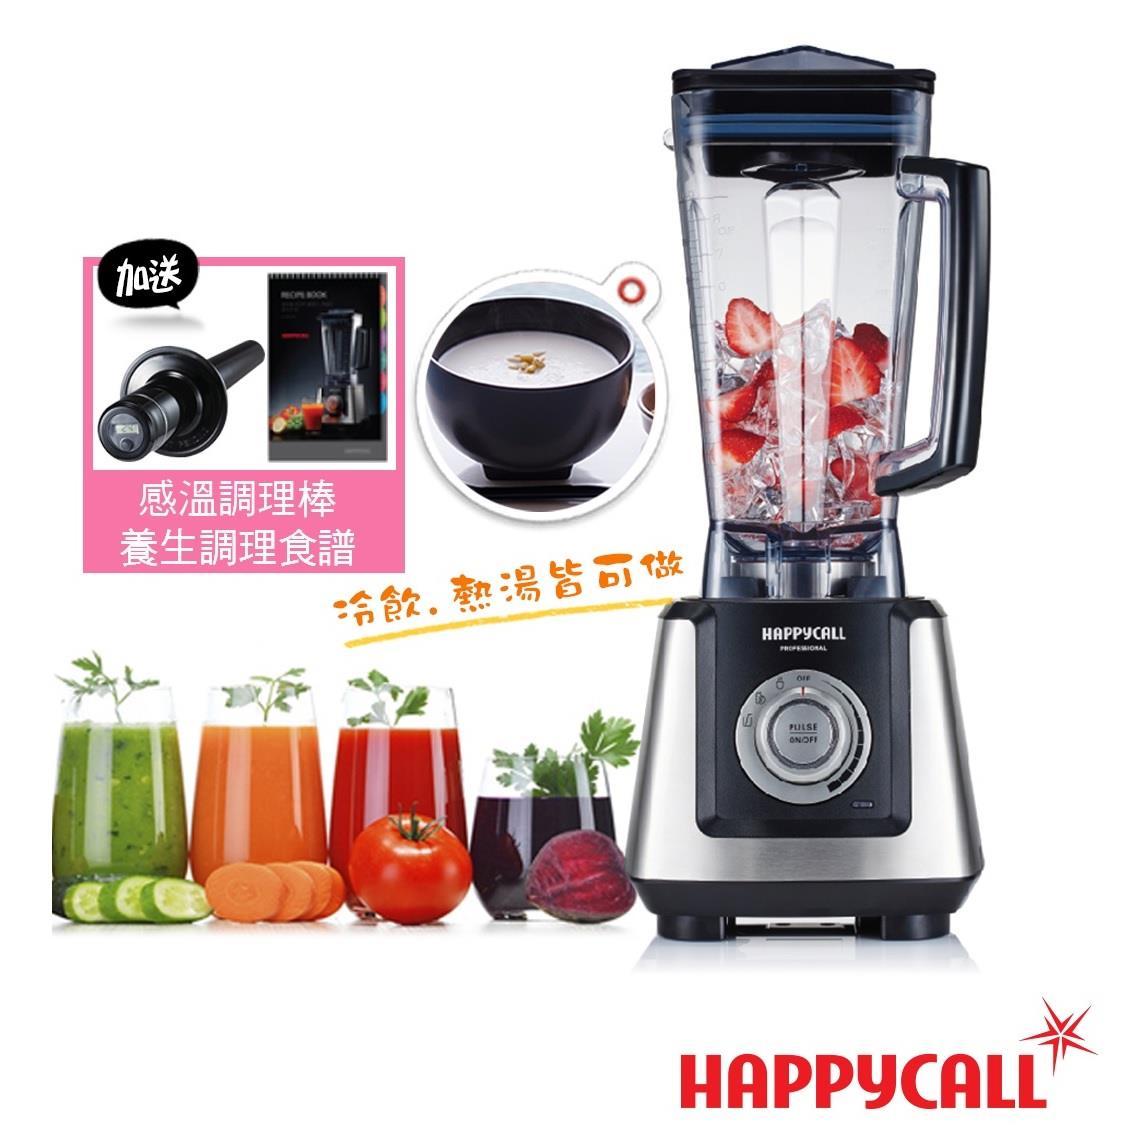 【HAPPYCALL】韓國多功智慧感溫健康調理機